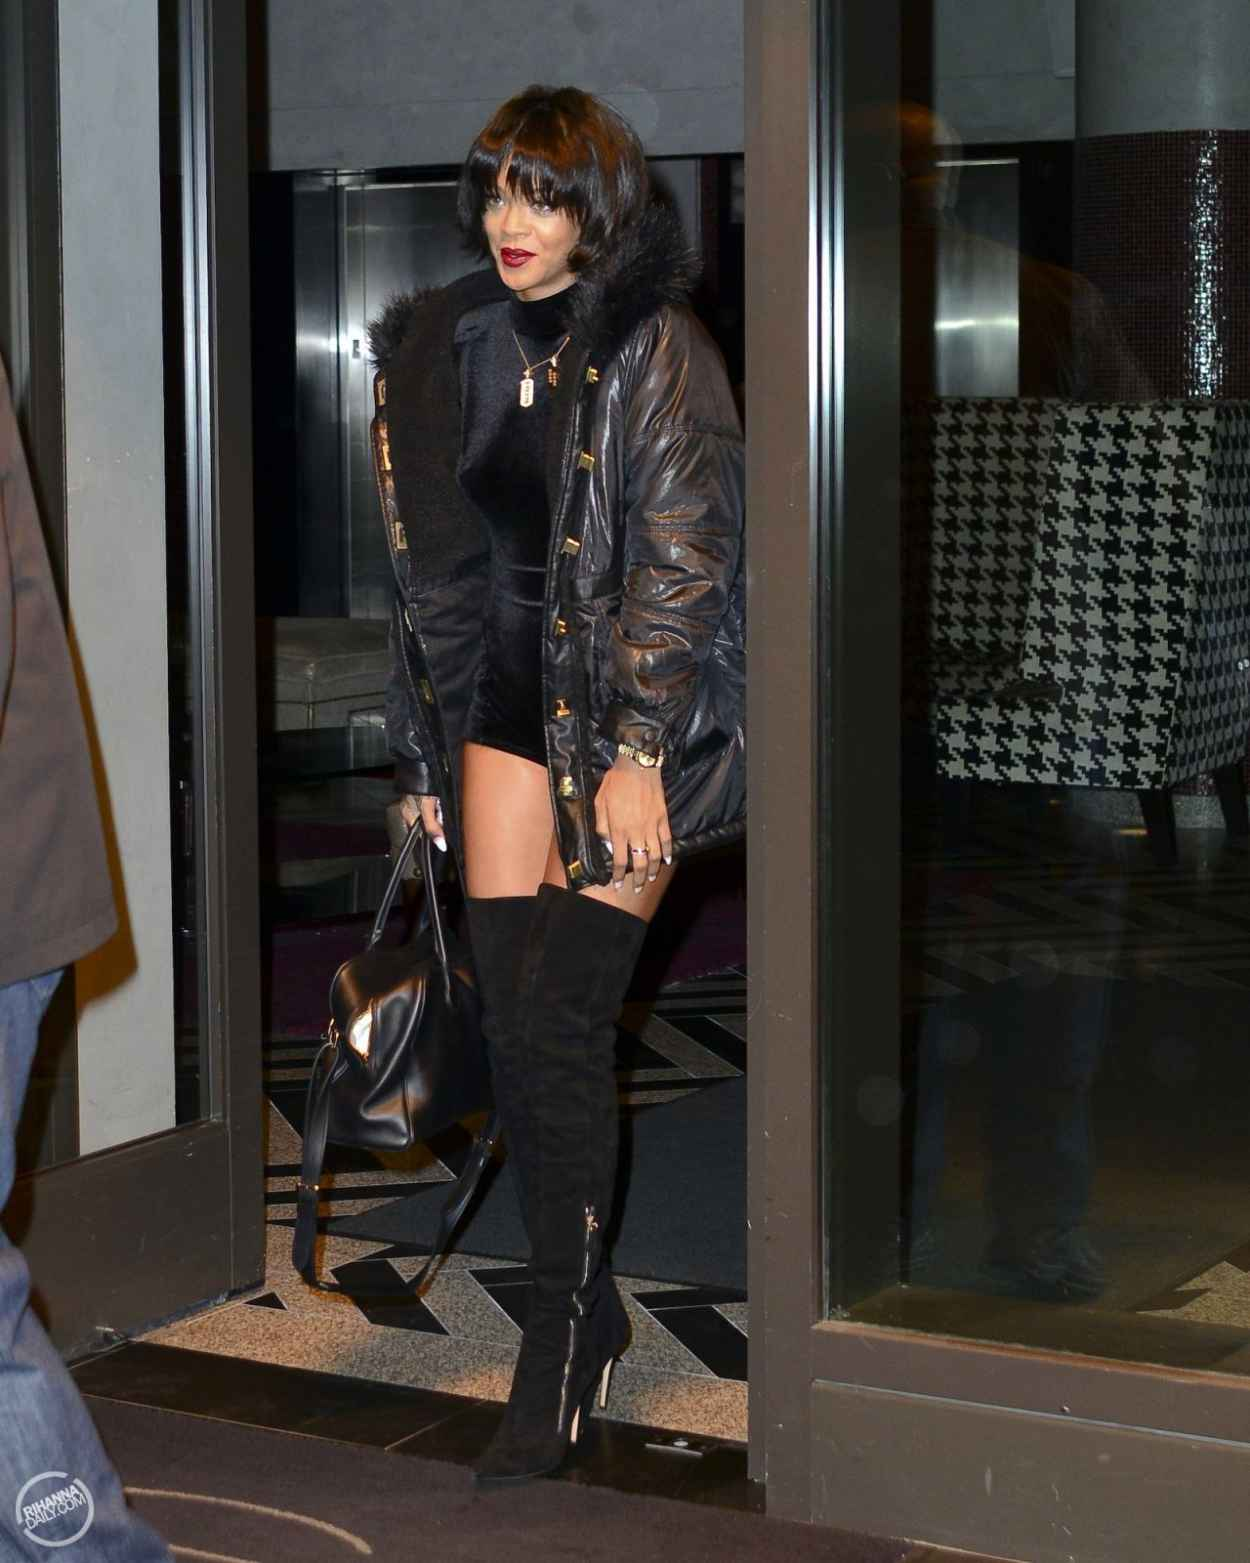 Rihanna Street Style - Wearing a short Jumpsuit in New York City - November 2015-2